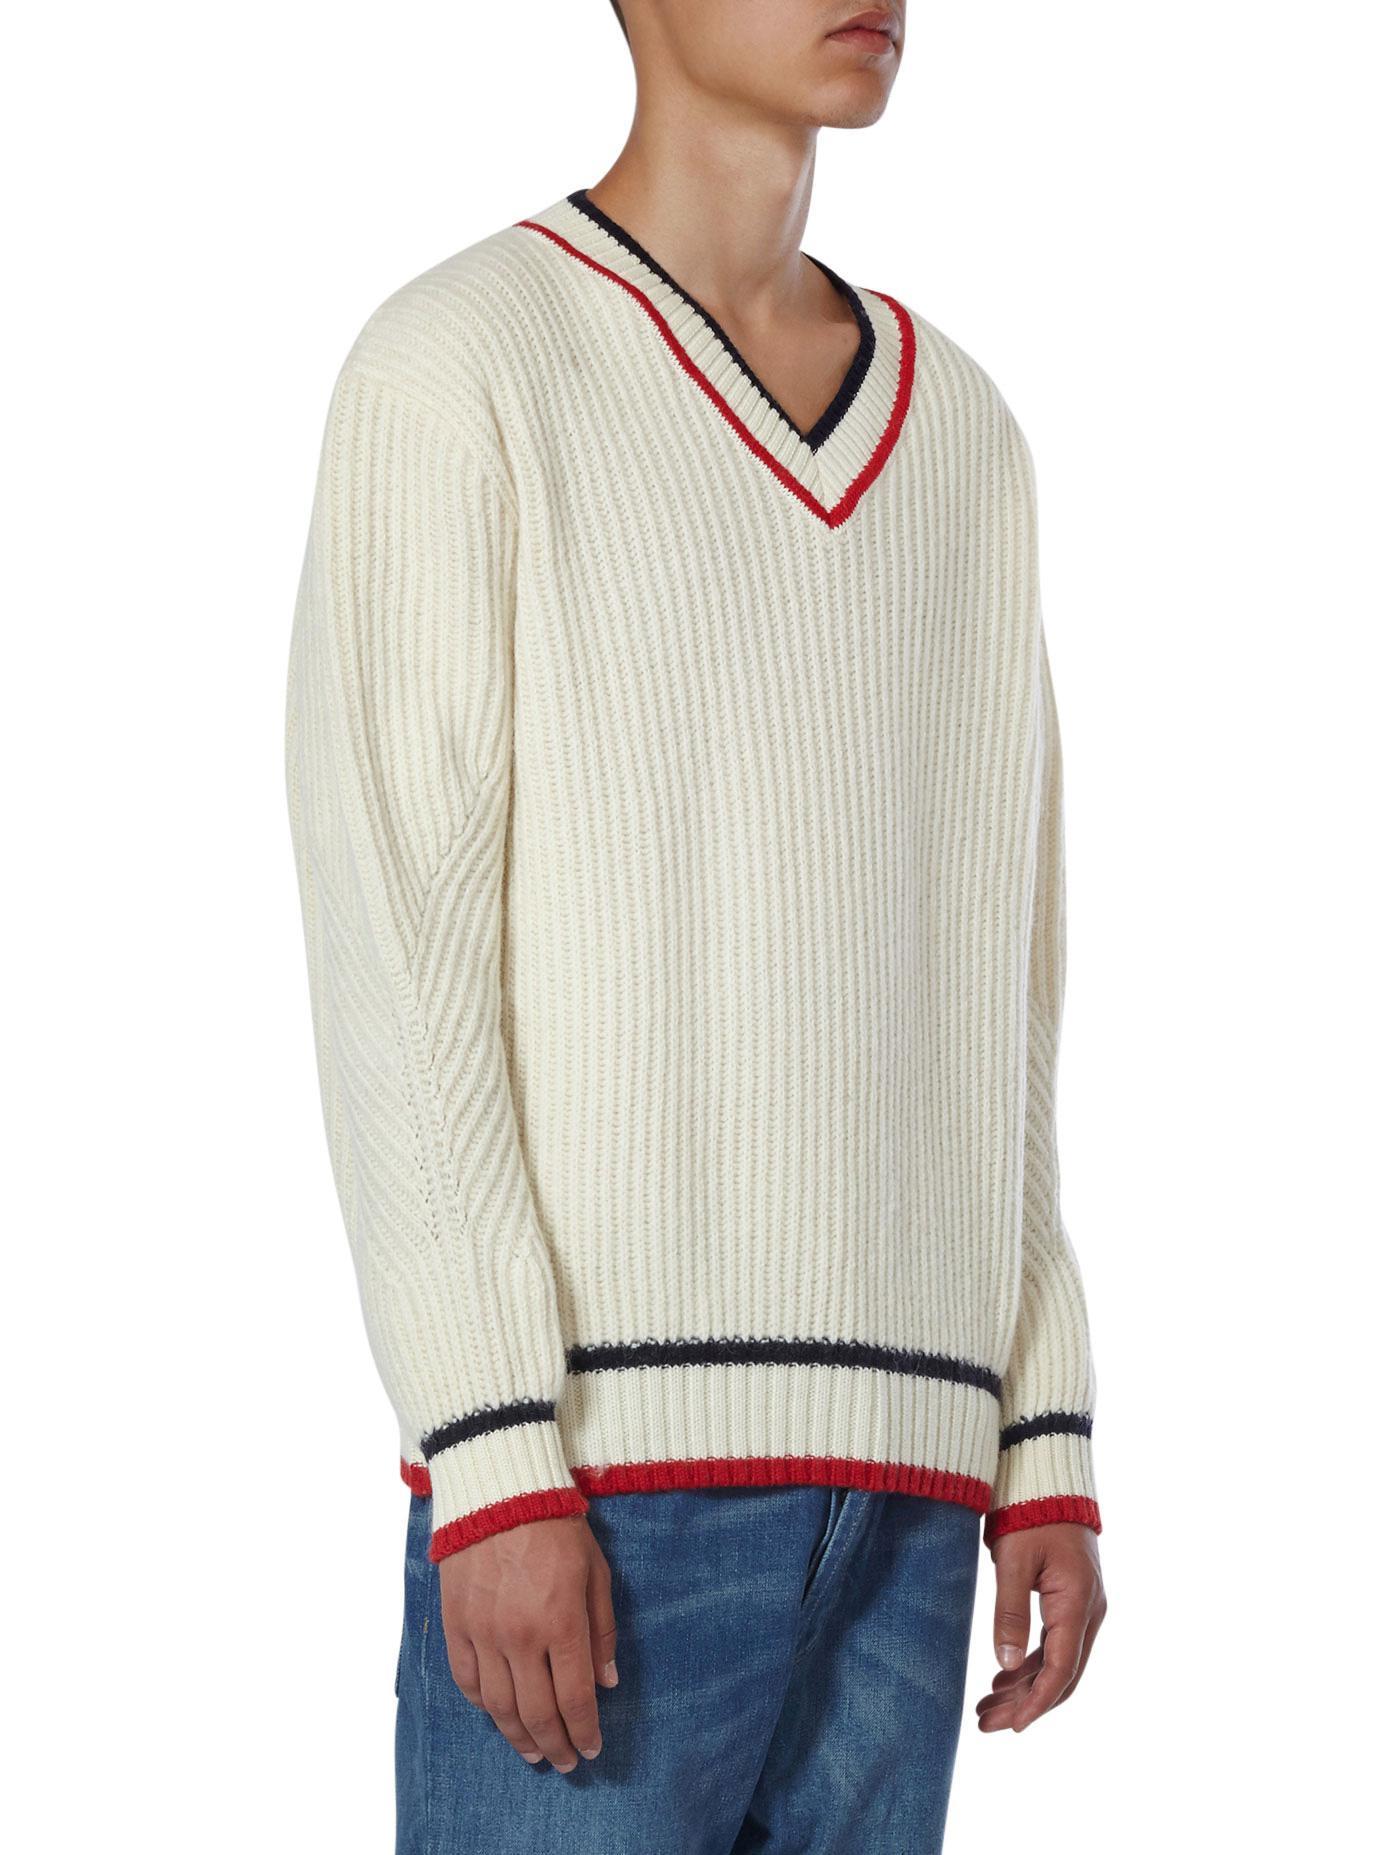 Maison Kitsuné Alpaca And Wool Blend Cricket Knit in Beige (Natural) for Men